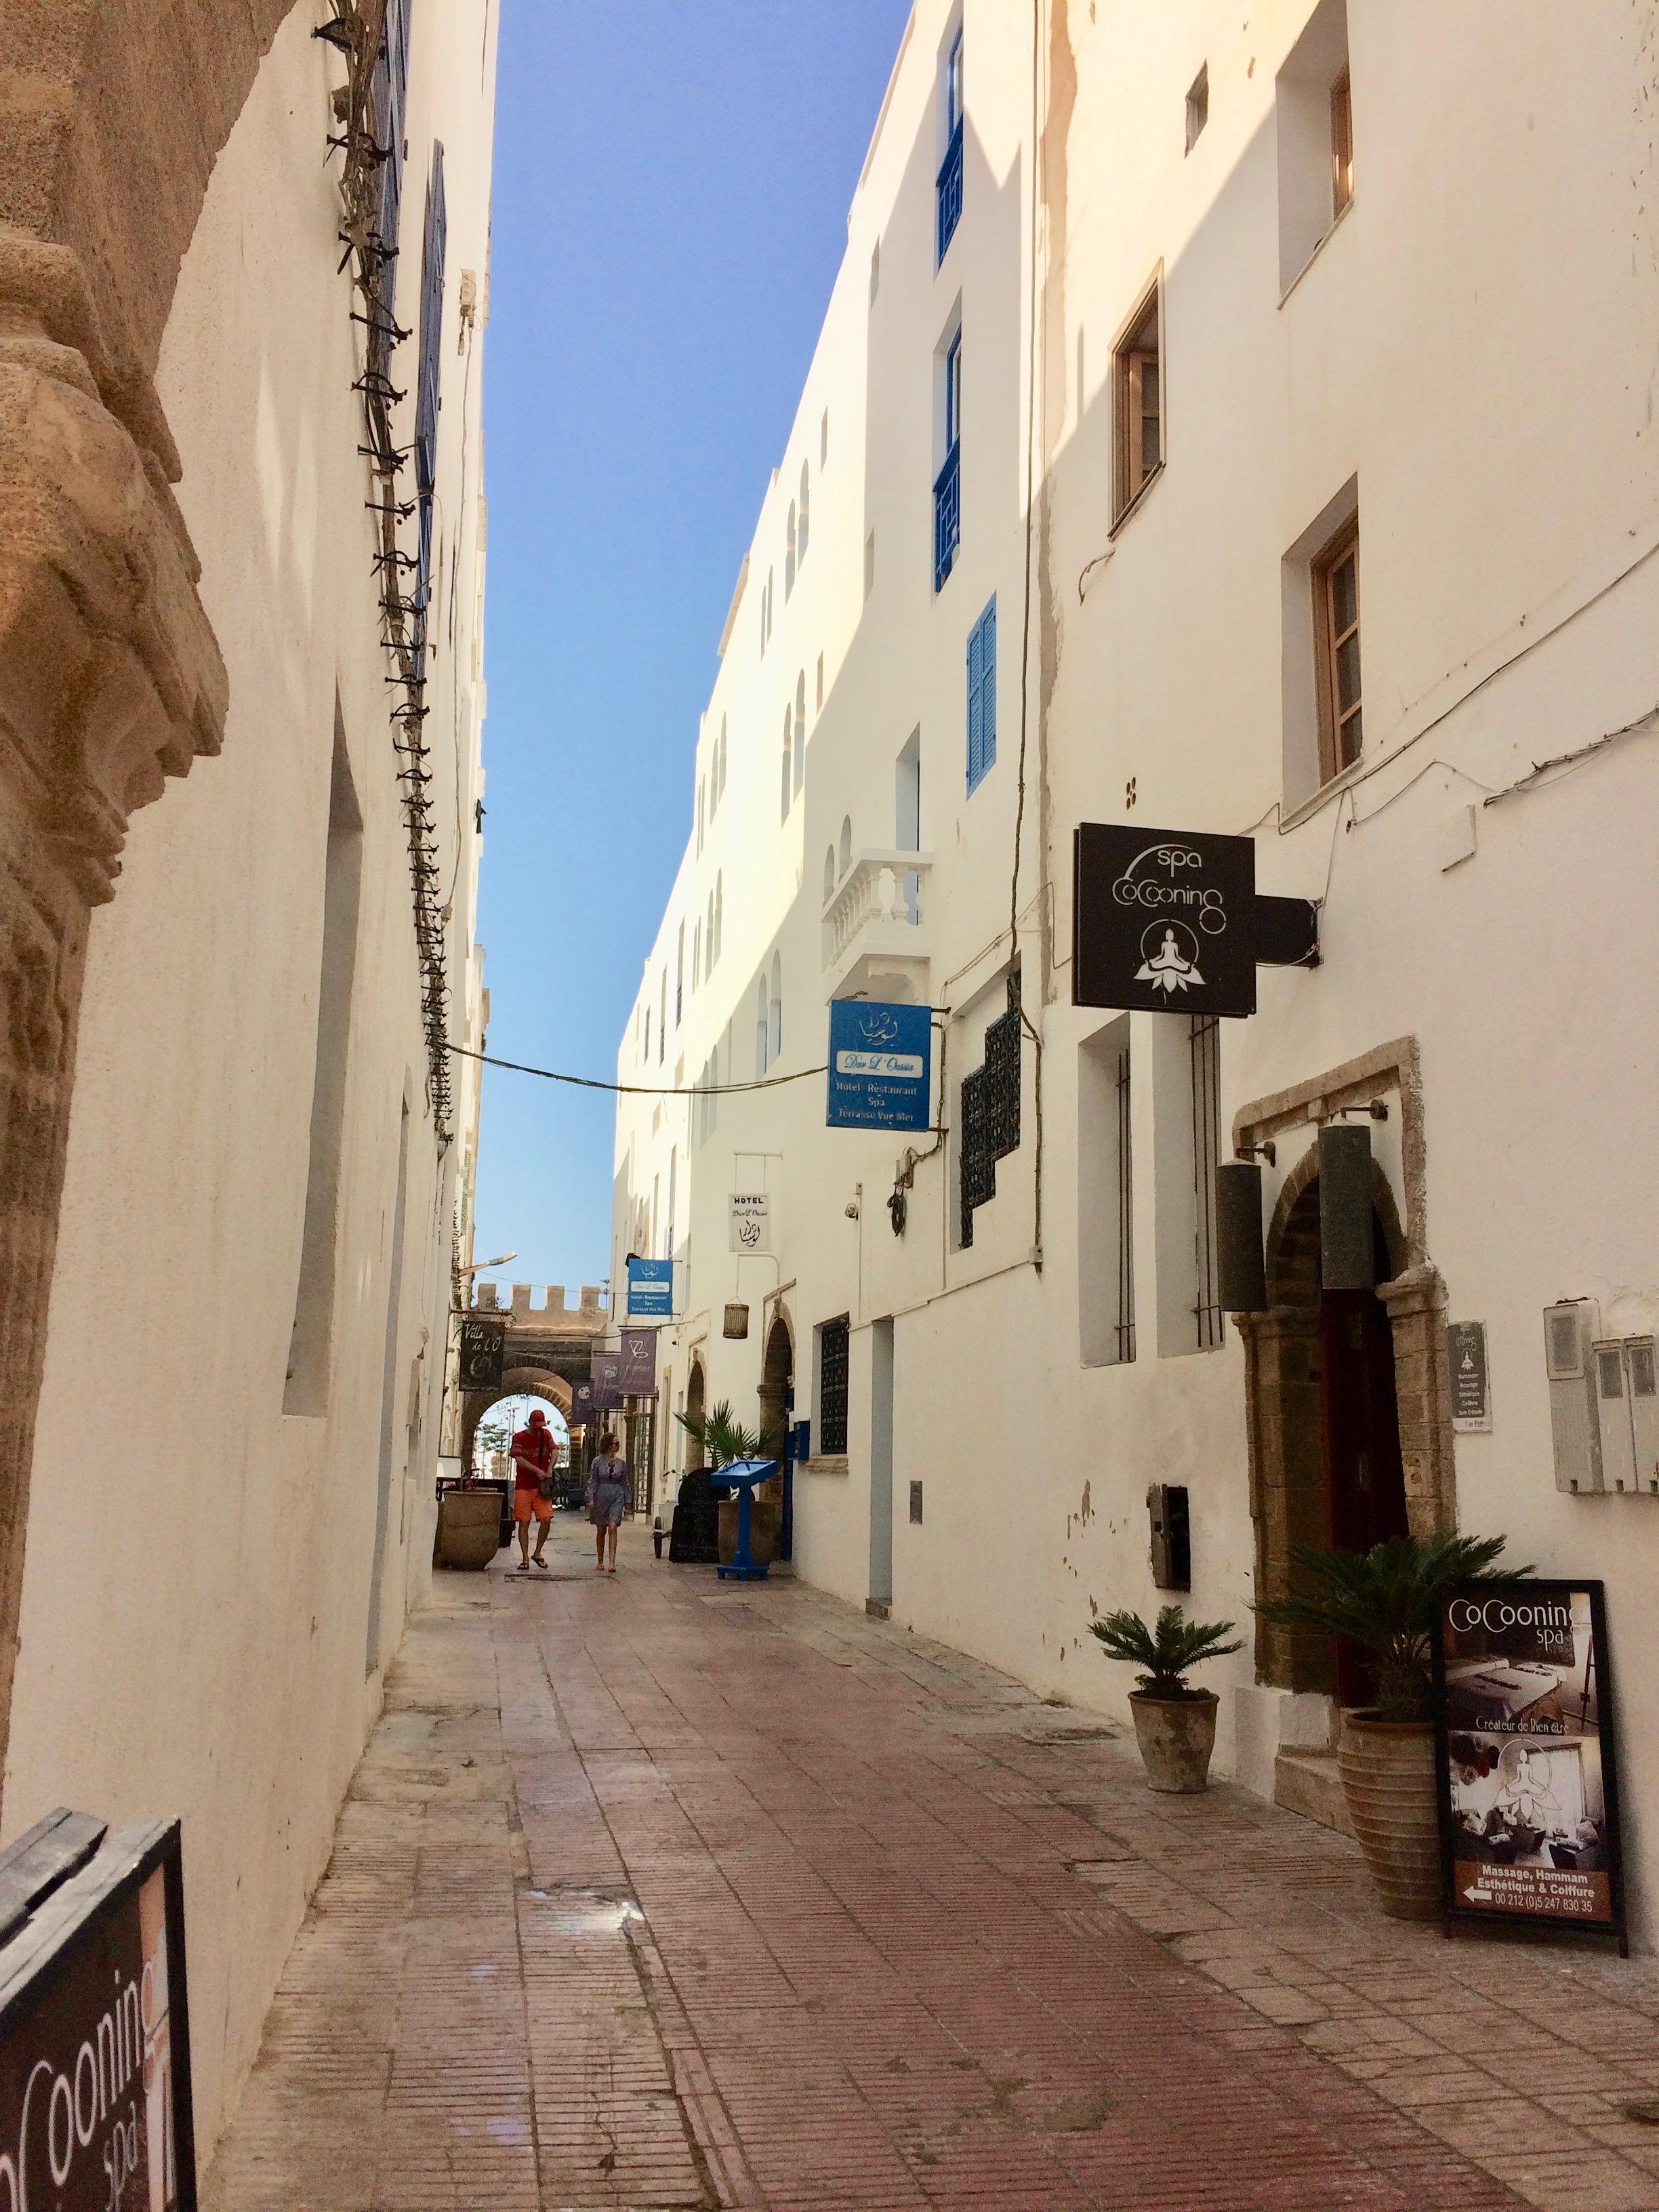 Walking lane in Essaouira